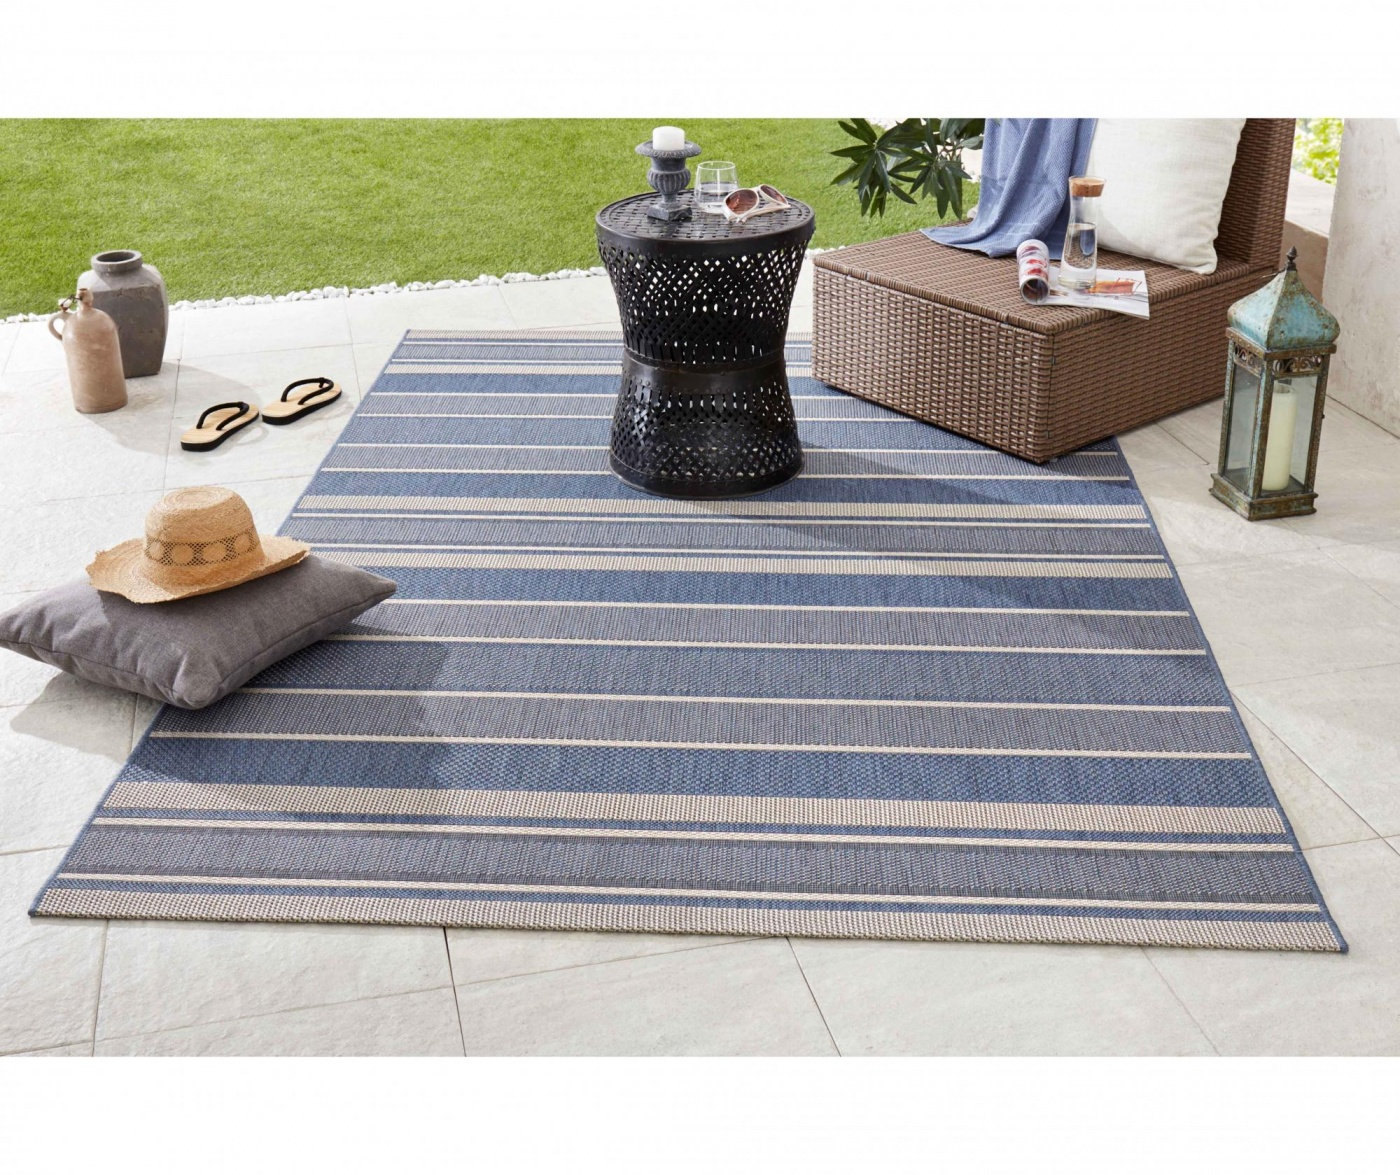 Covor de exterior Meadow Strap Blue 160x230 cm